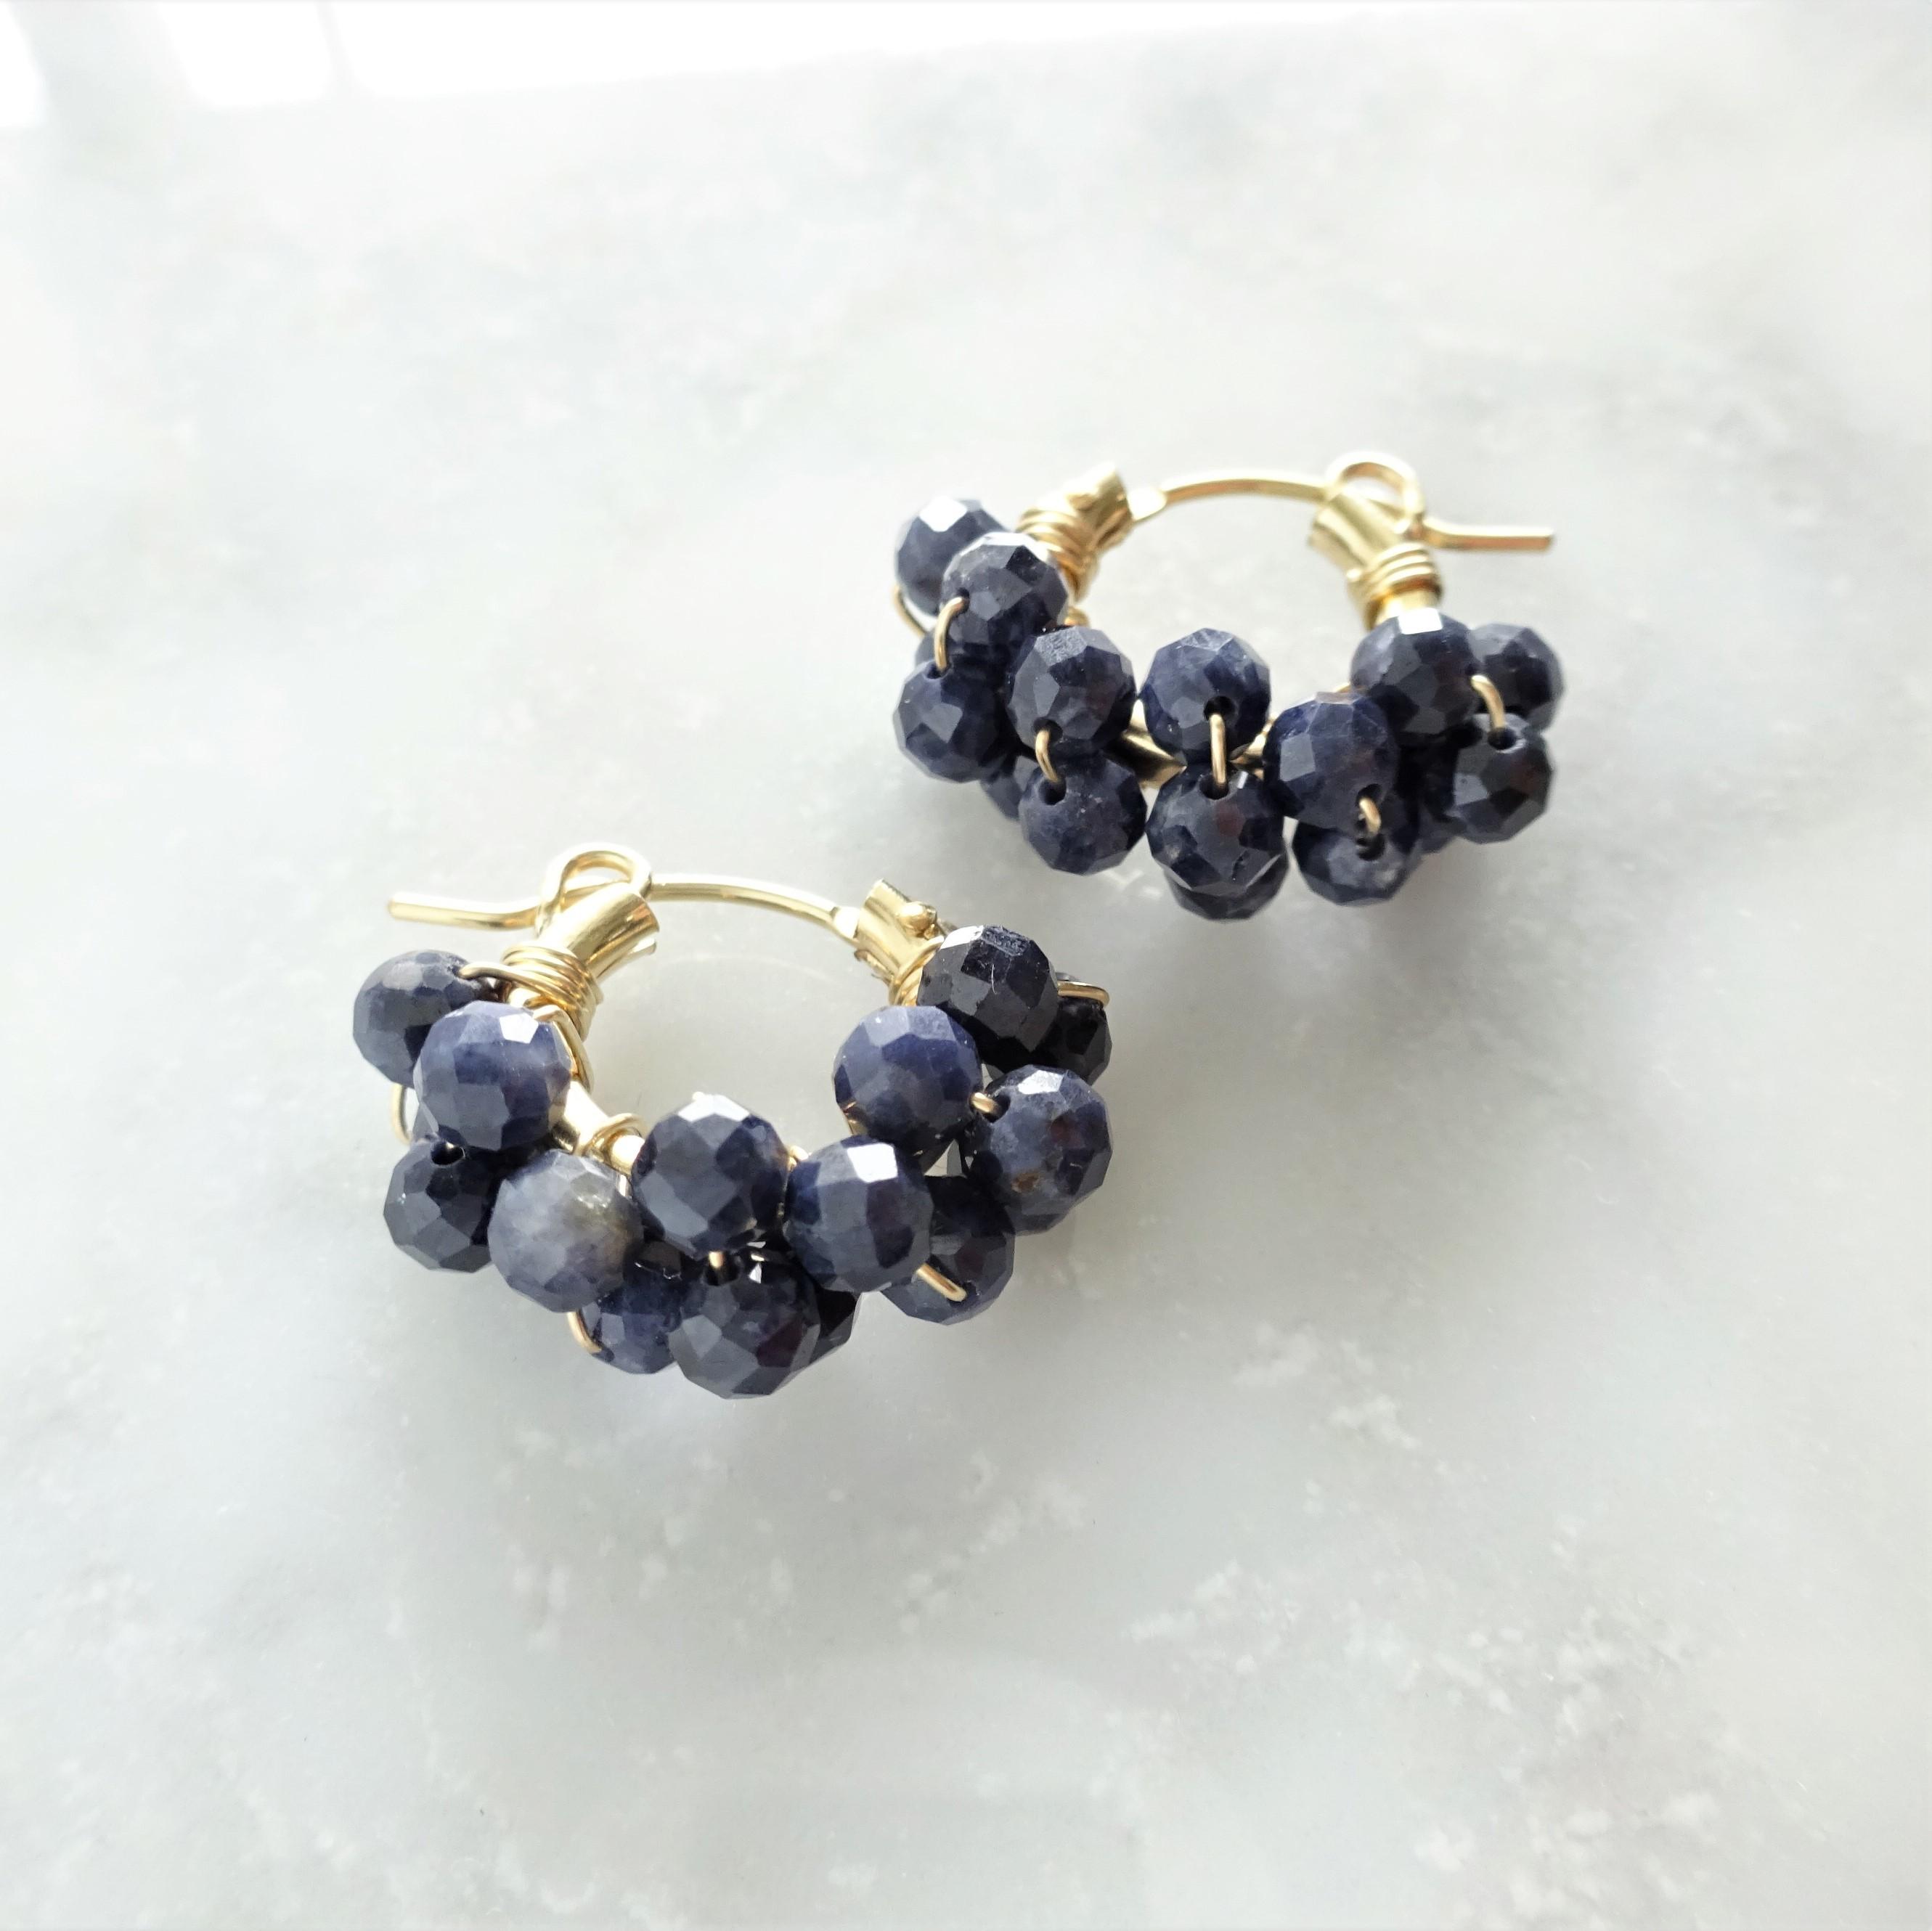 送料無料 14kgf*Sapphire wrapped pierced earring / earring